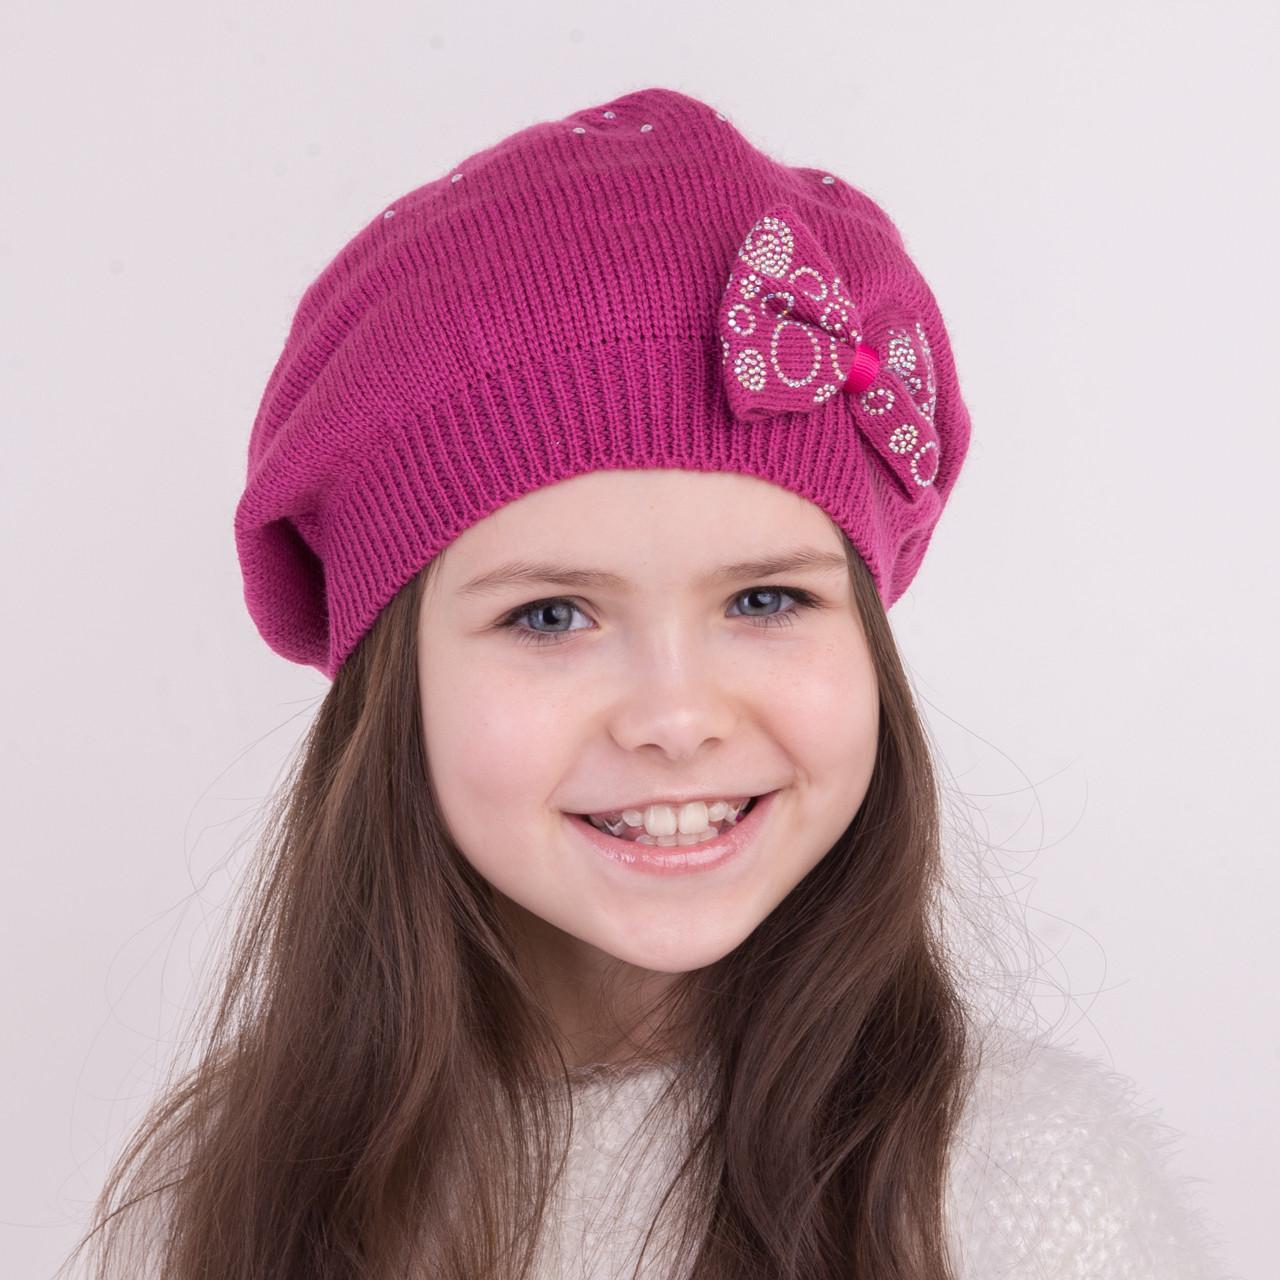 Вязаная шапка берет для девочки на весну - Артикул 0363